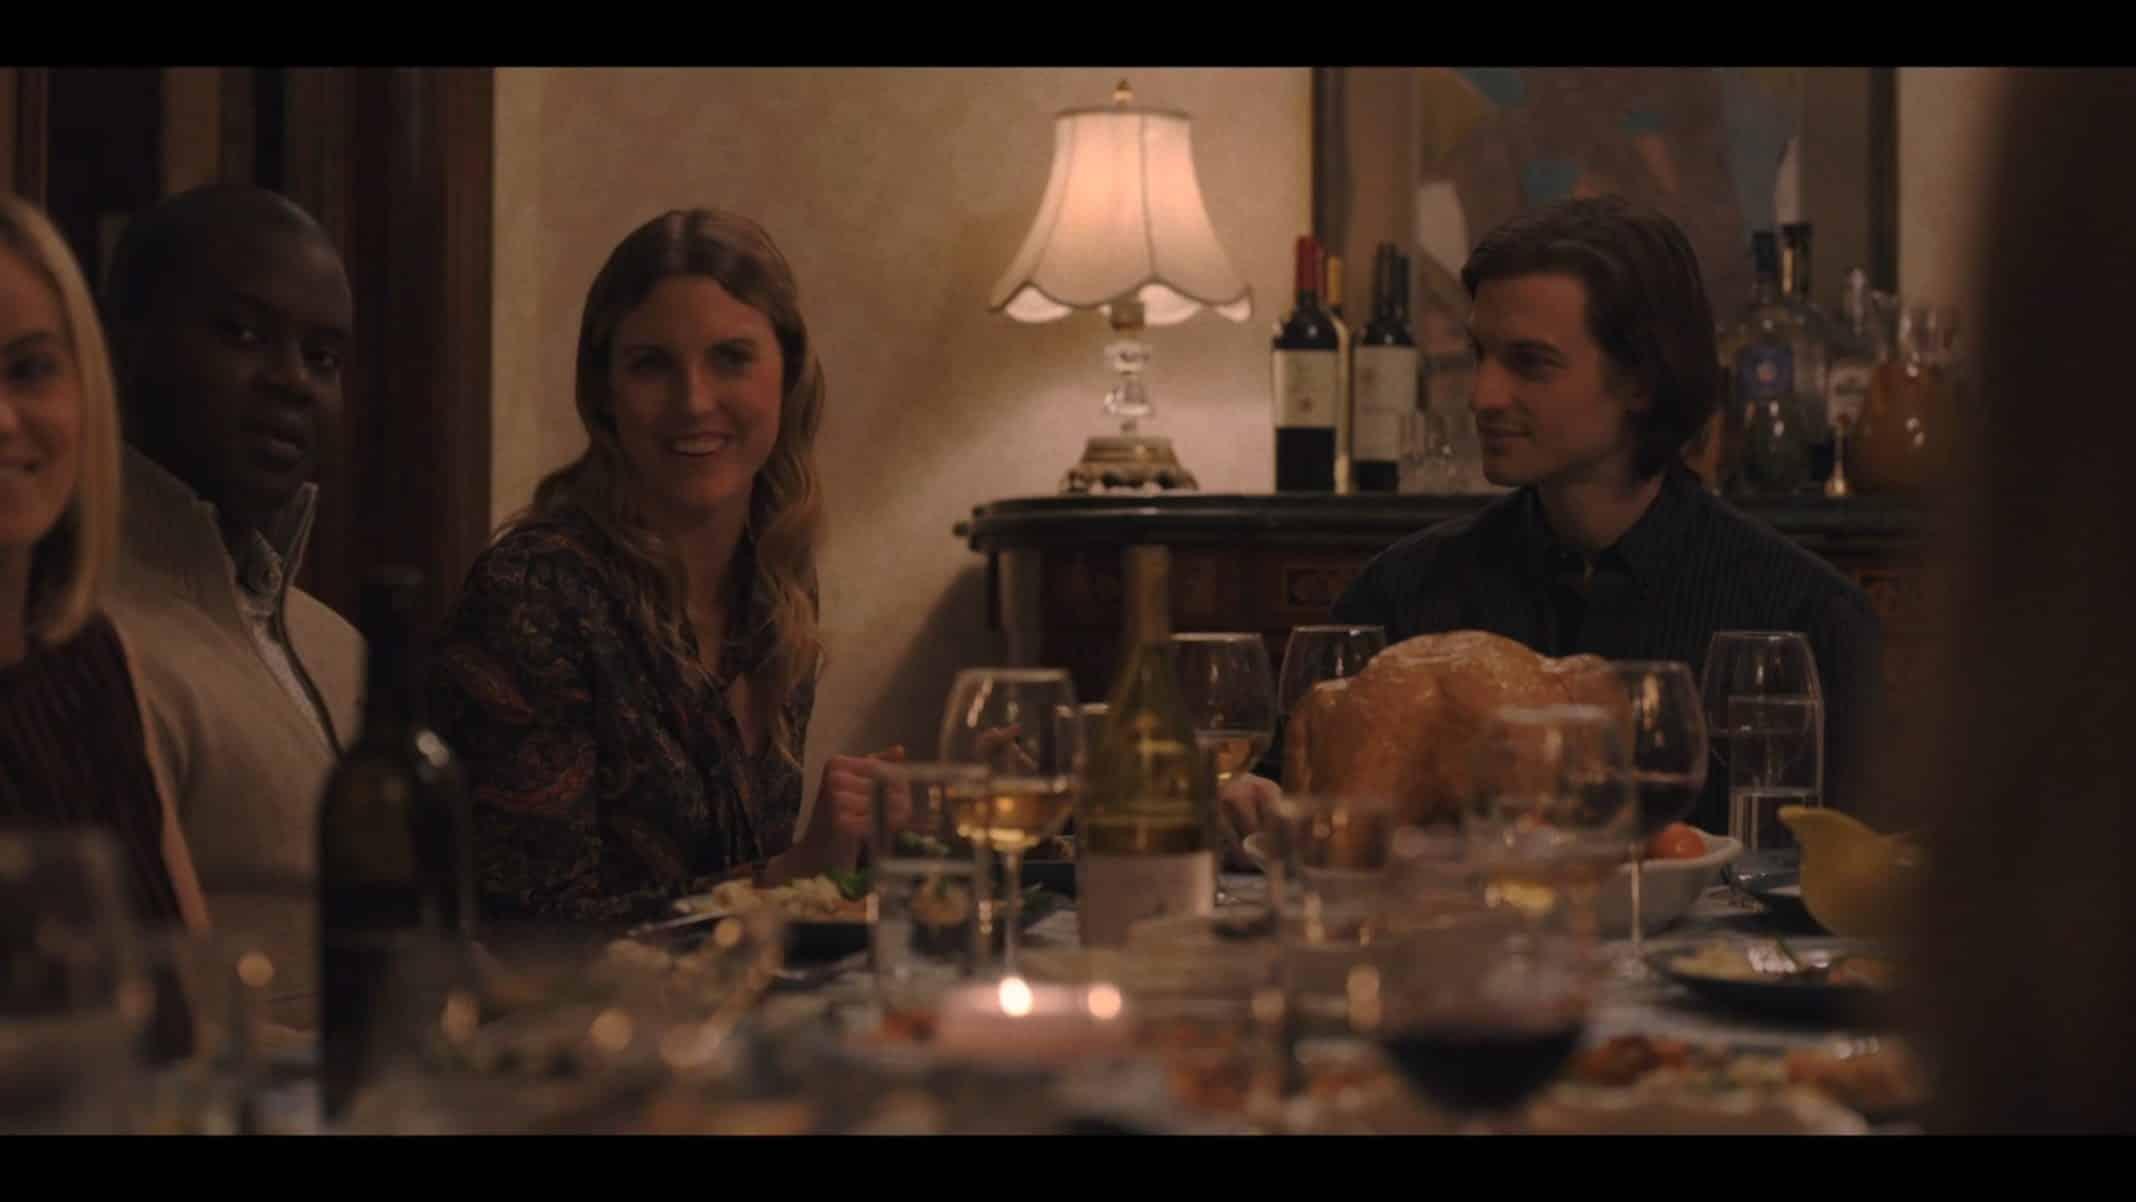 Laurel (Diana Irvine) at Jim's friendsgiving.